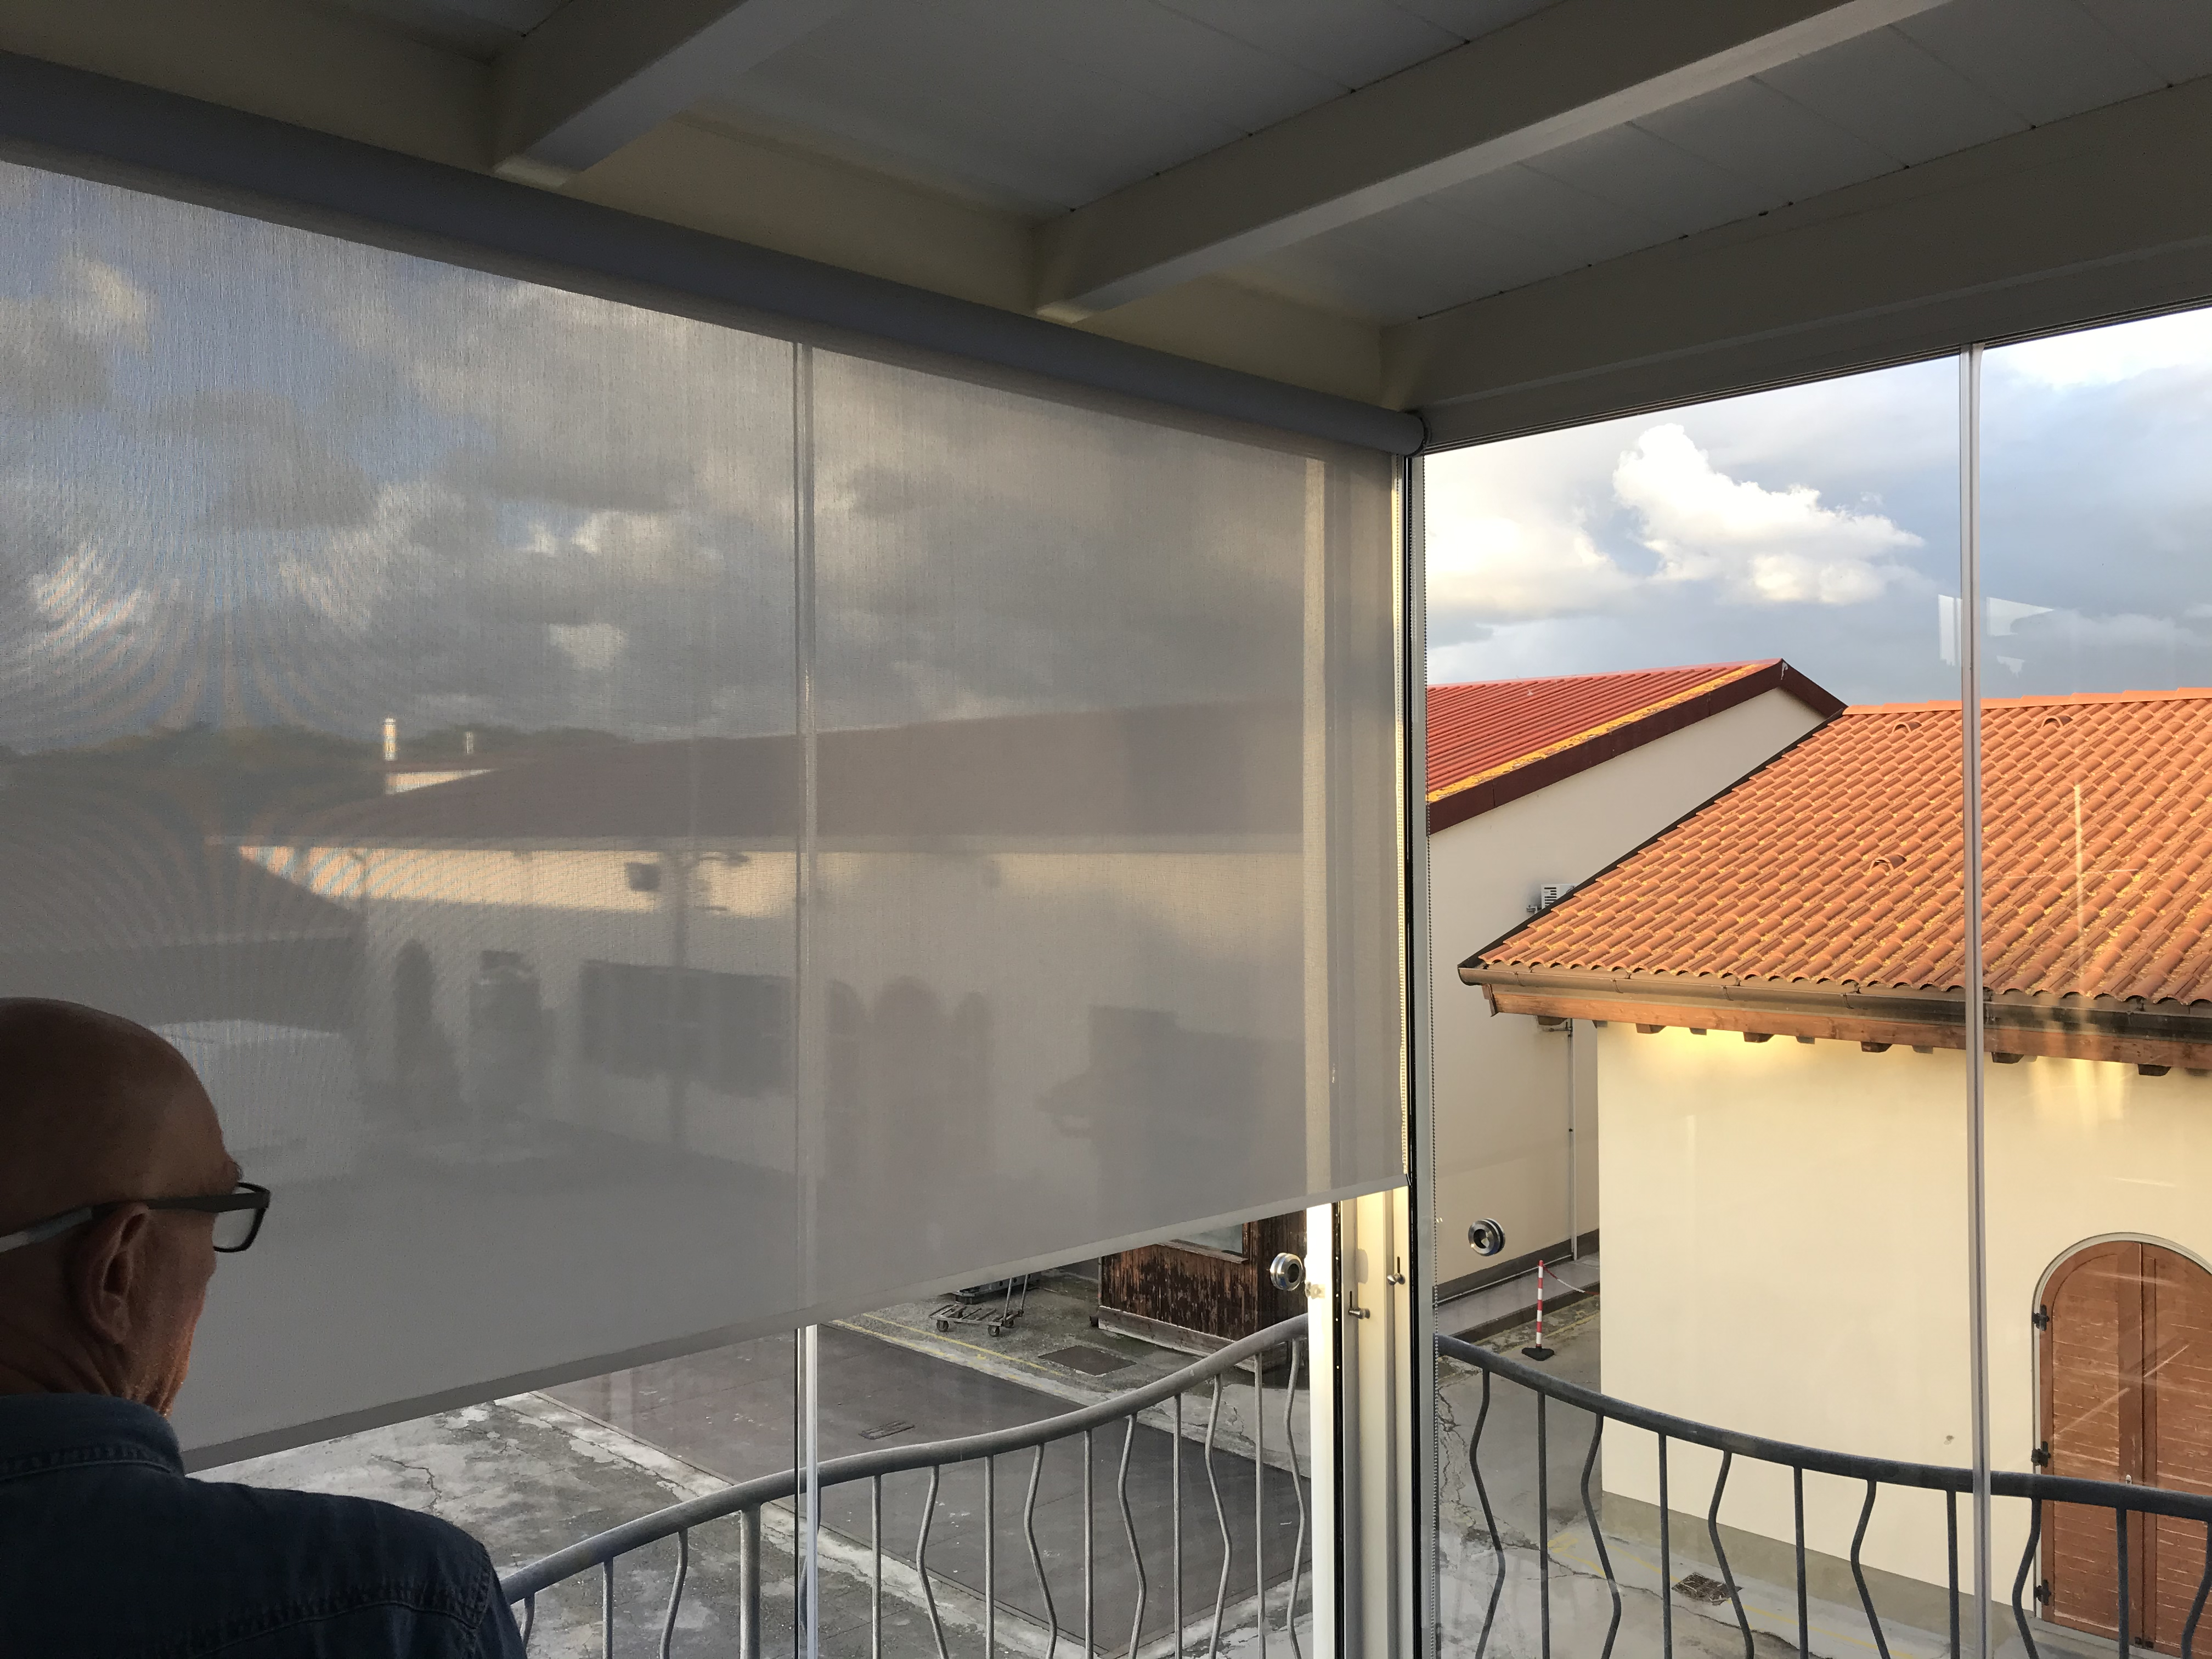 Interno-Veranda-Vetrate-Tende filtranti.